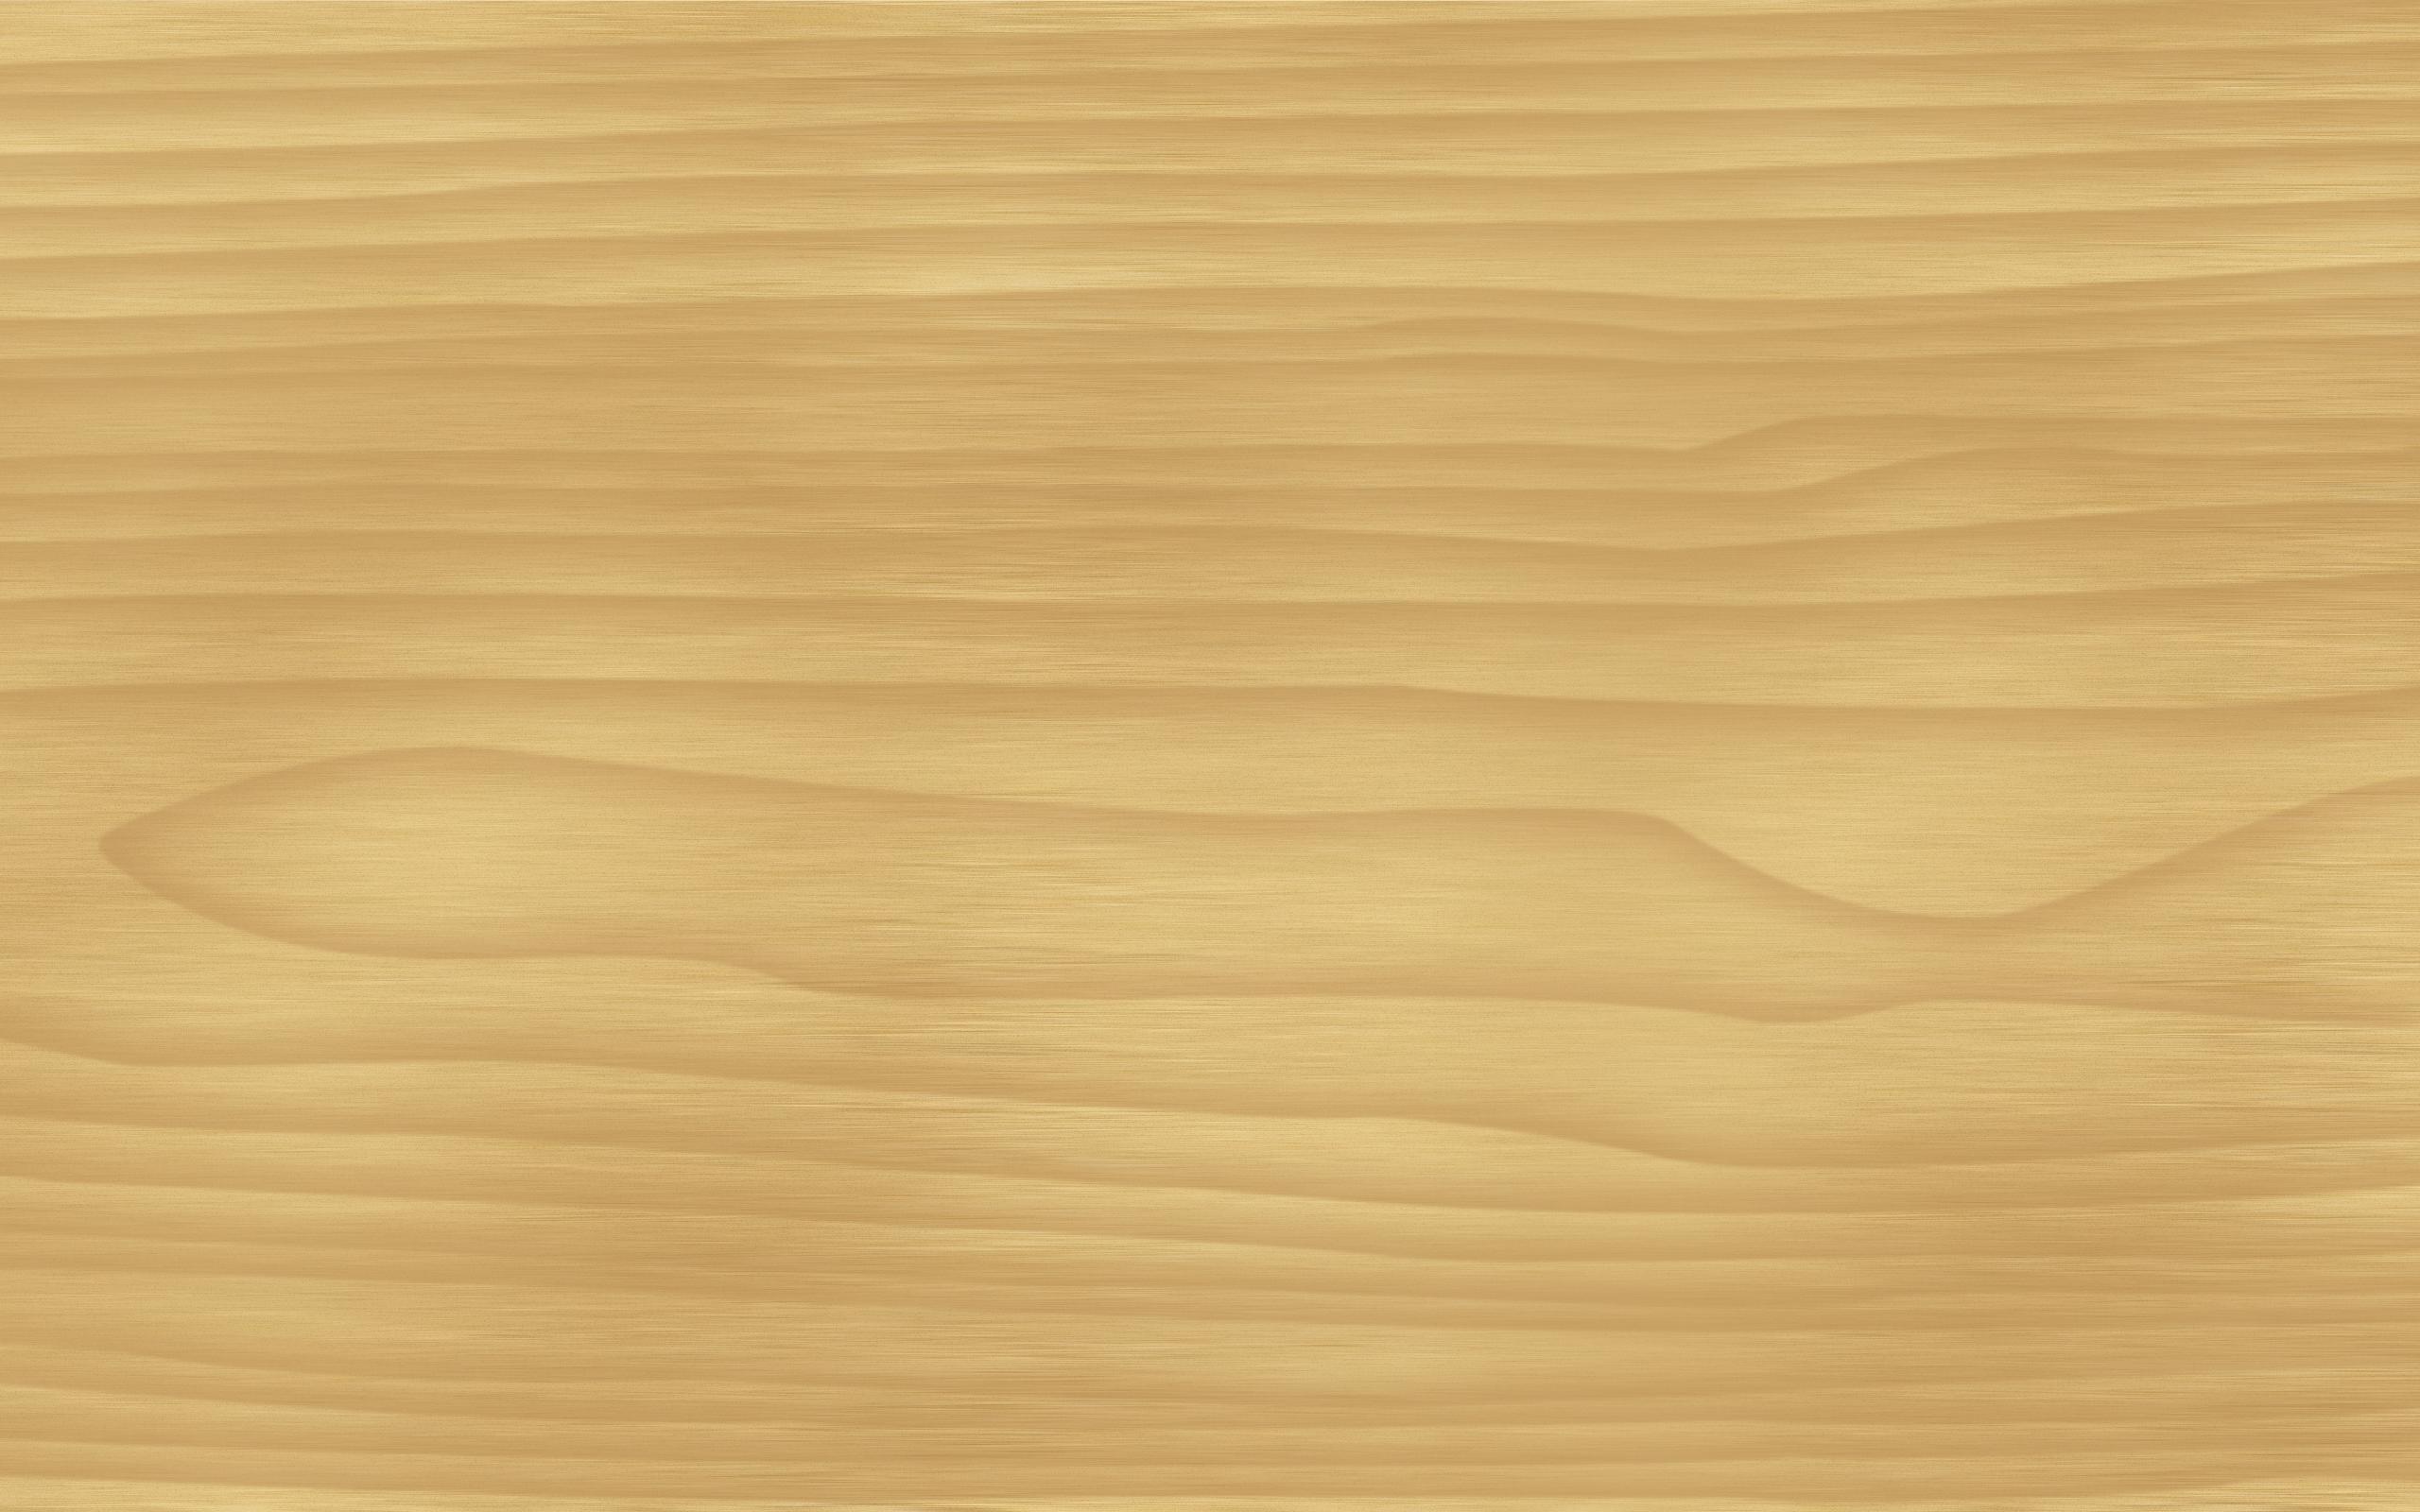 cg textures